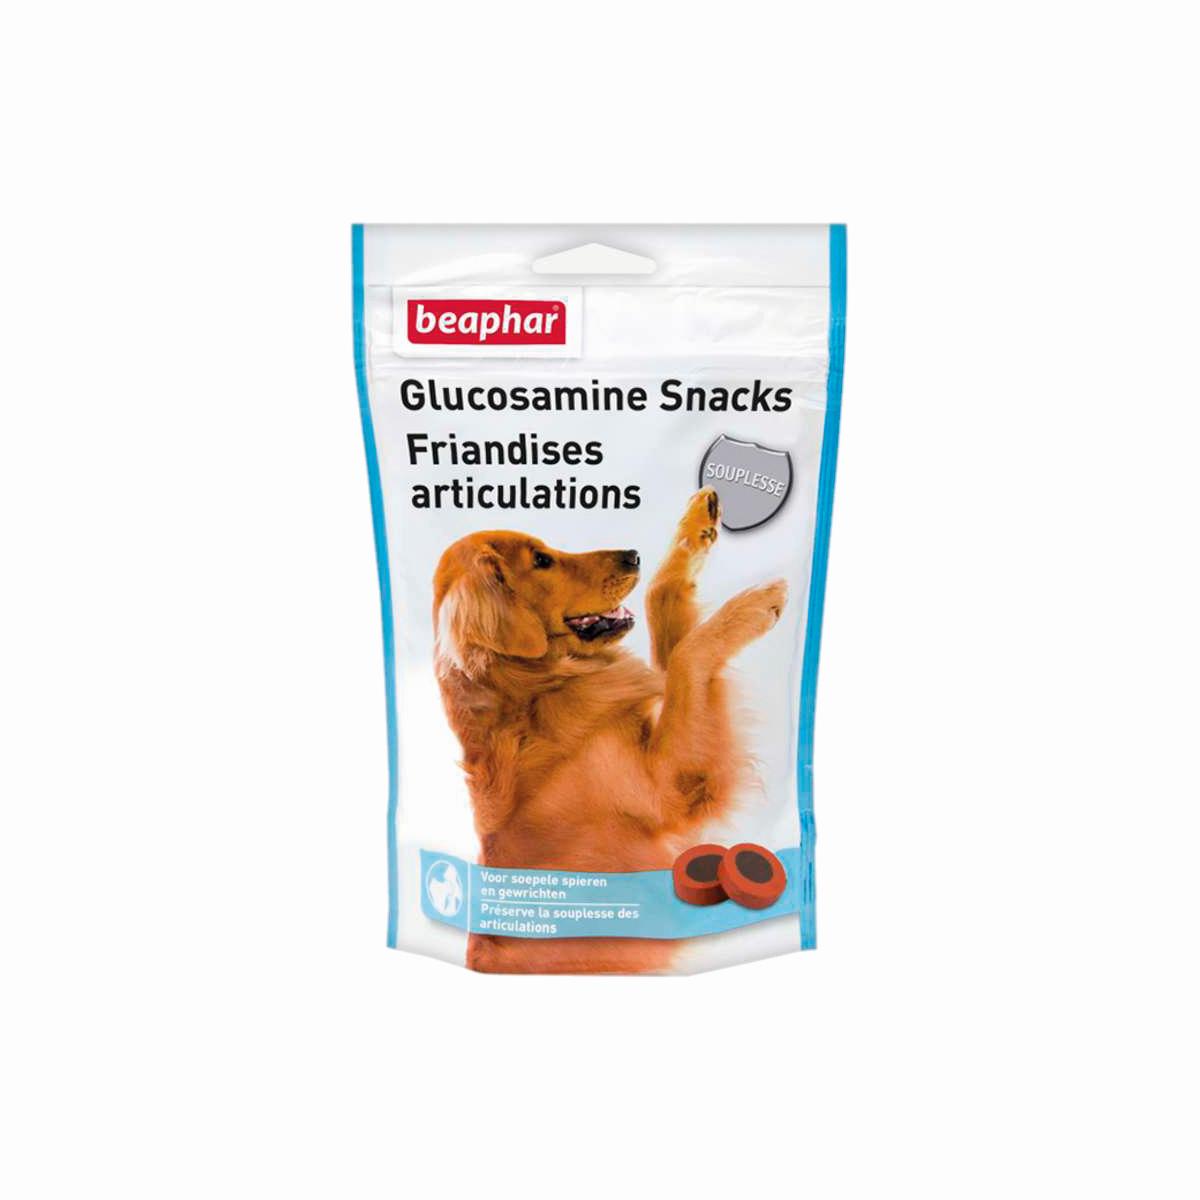 Beaphar Glucosamine Snacks voor de hond 150 gram